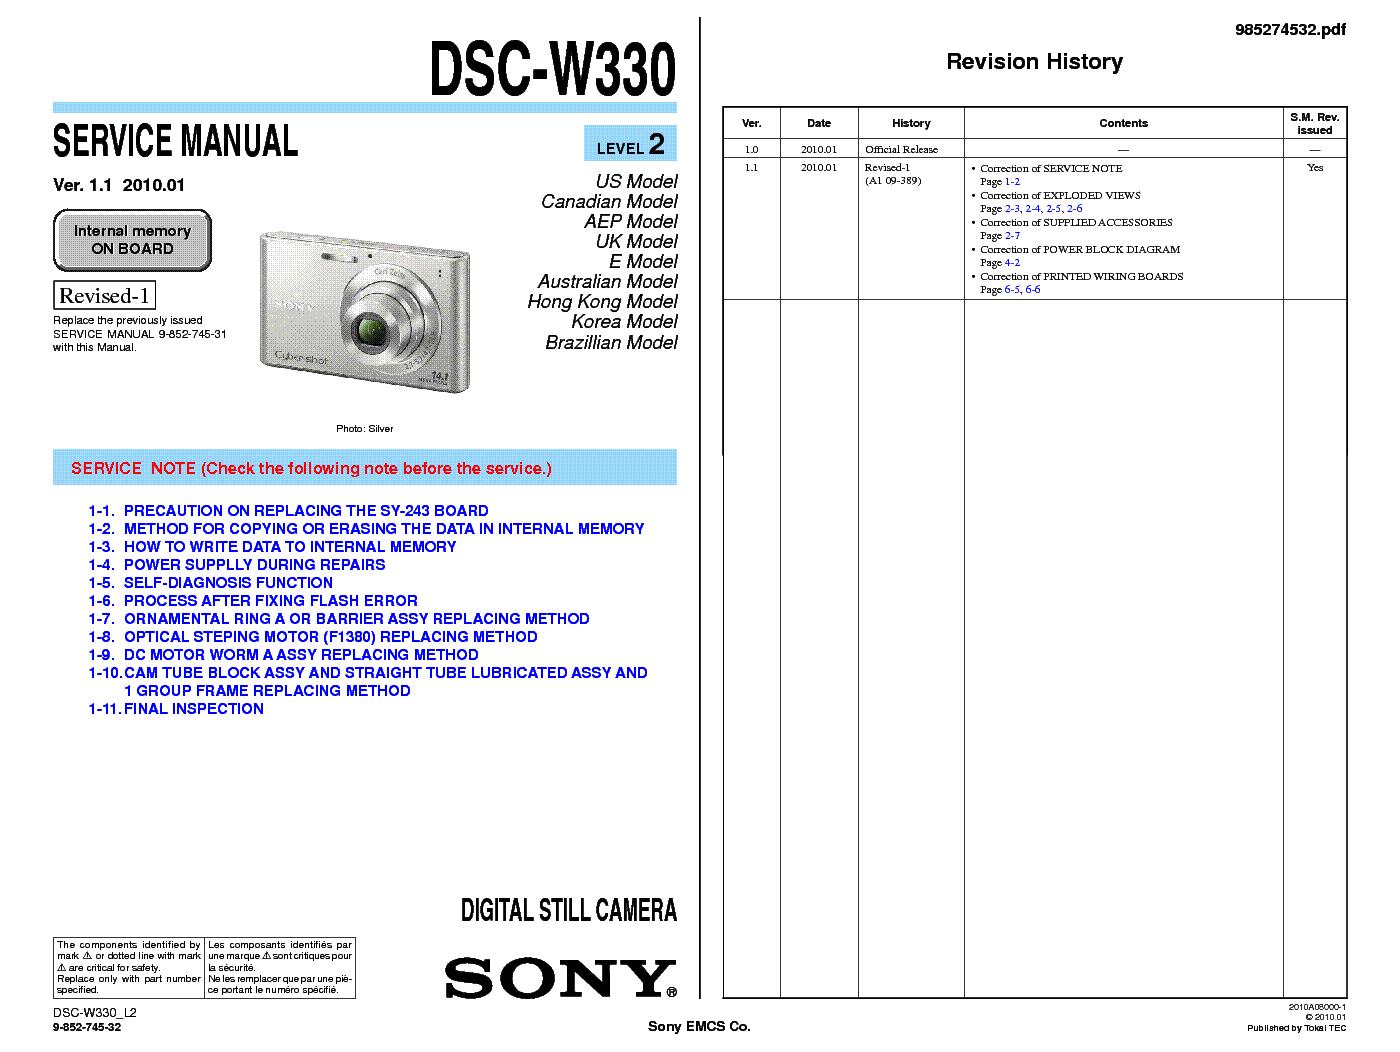 Sony cyber-shot dsc-w330 service & repair manual download downloa.